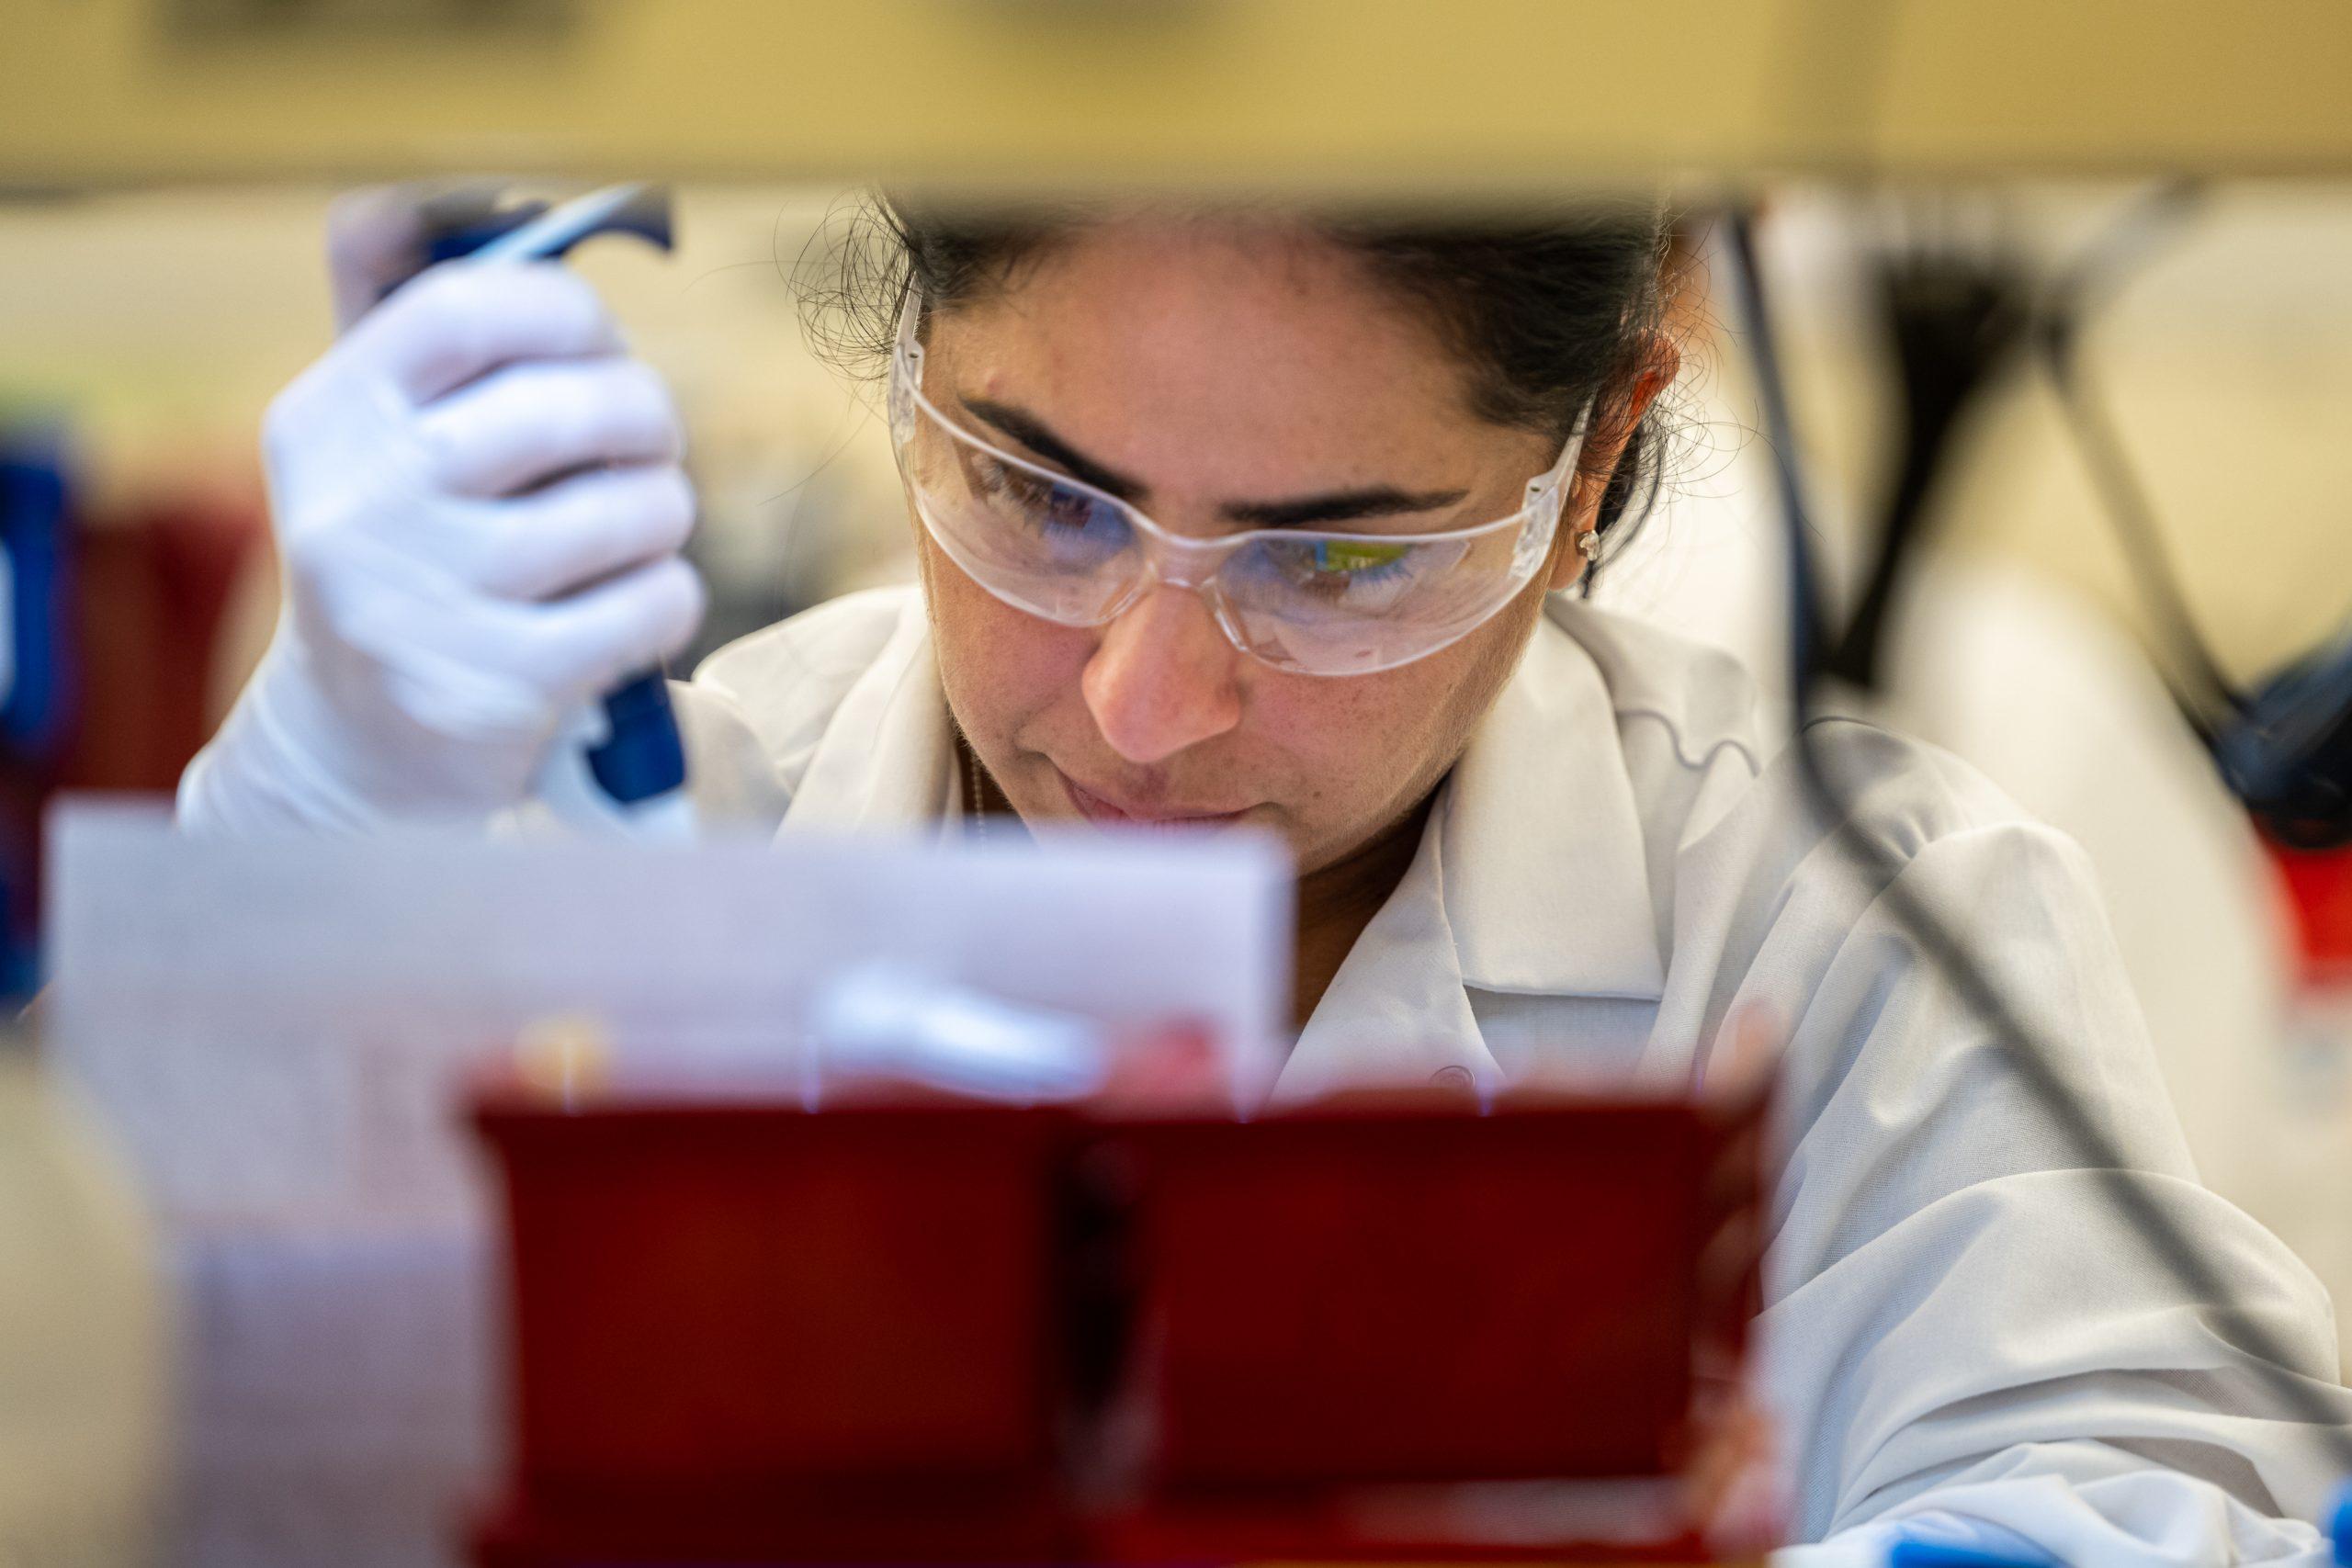 Biomarker Sciences